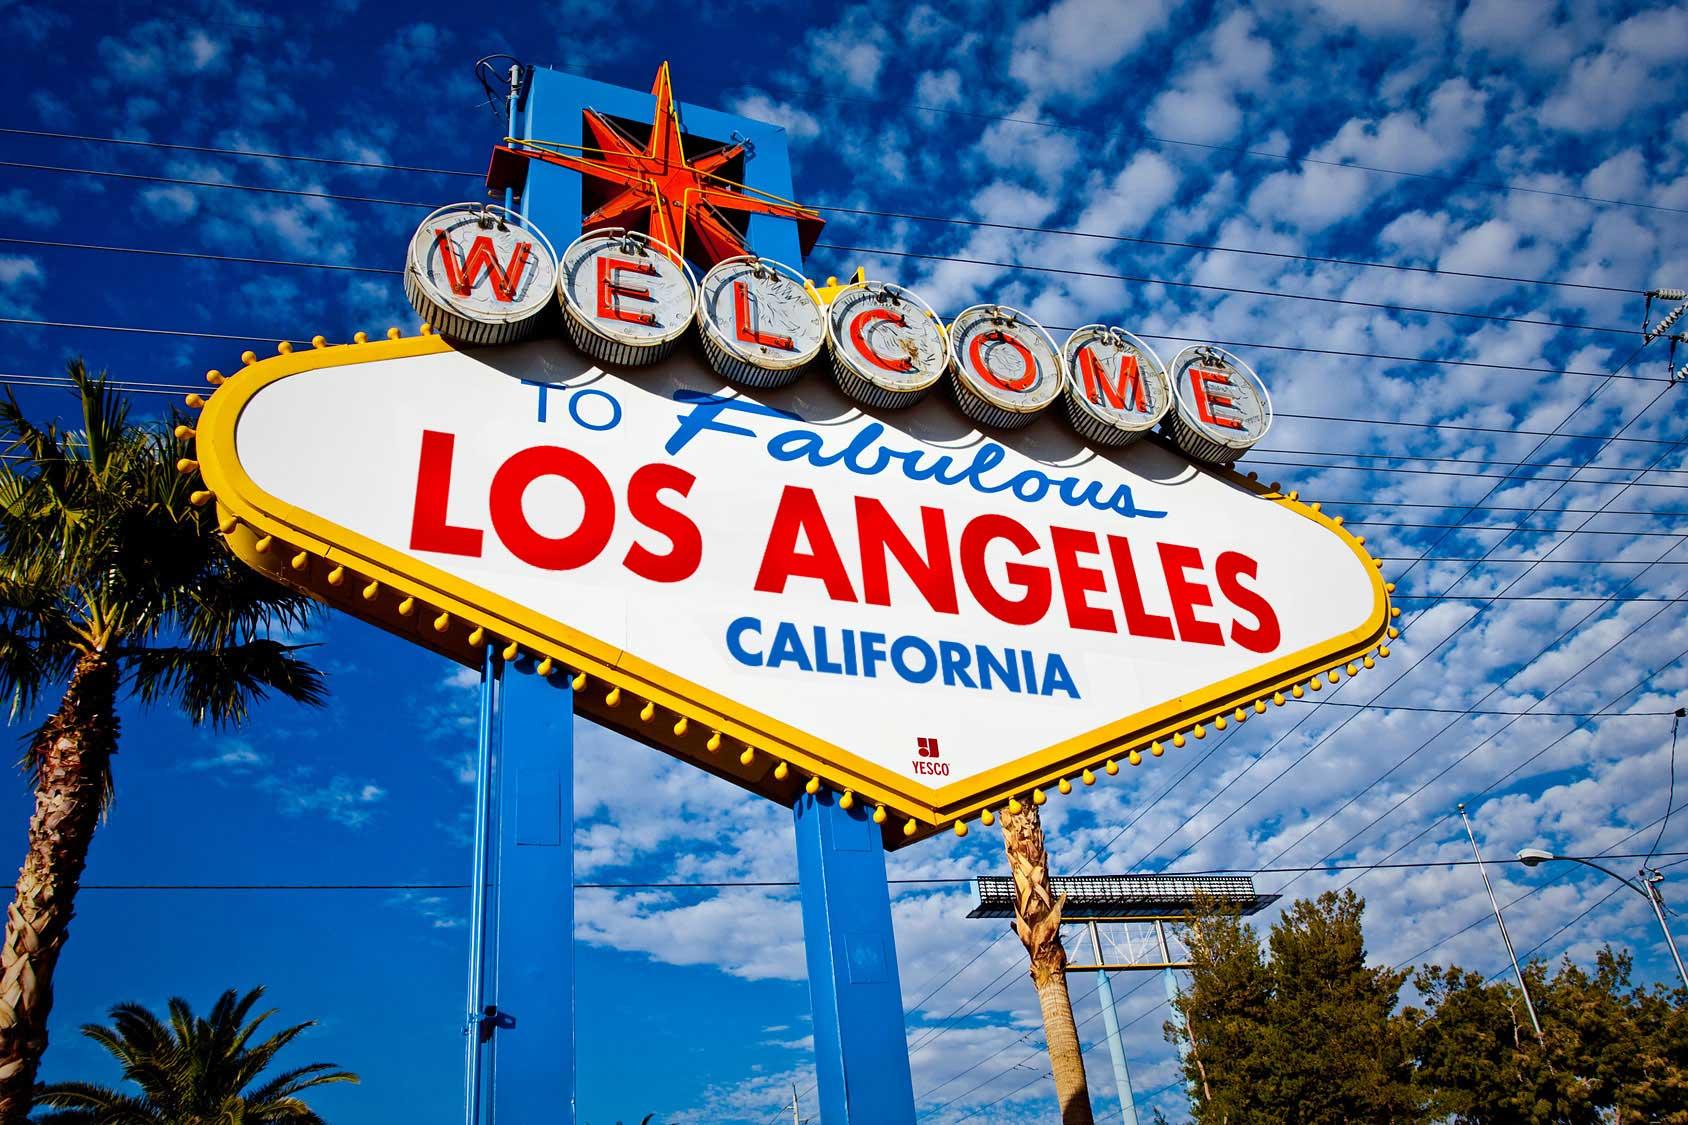 FSN LOS ANGELES - Part of the FSN LIVE network